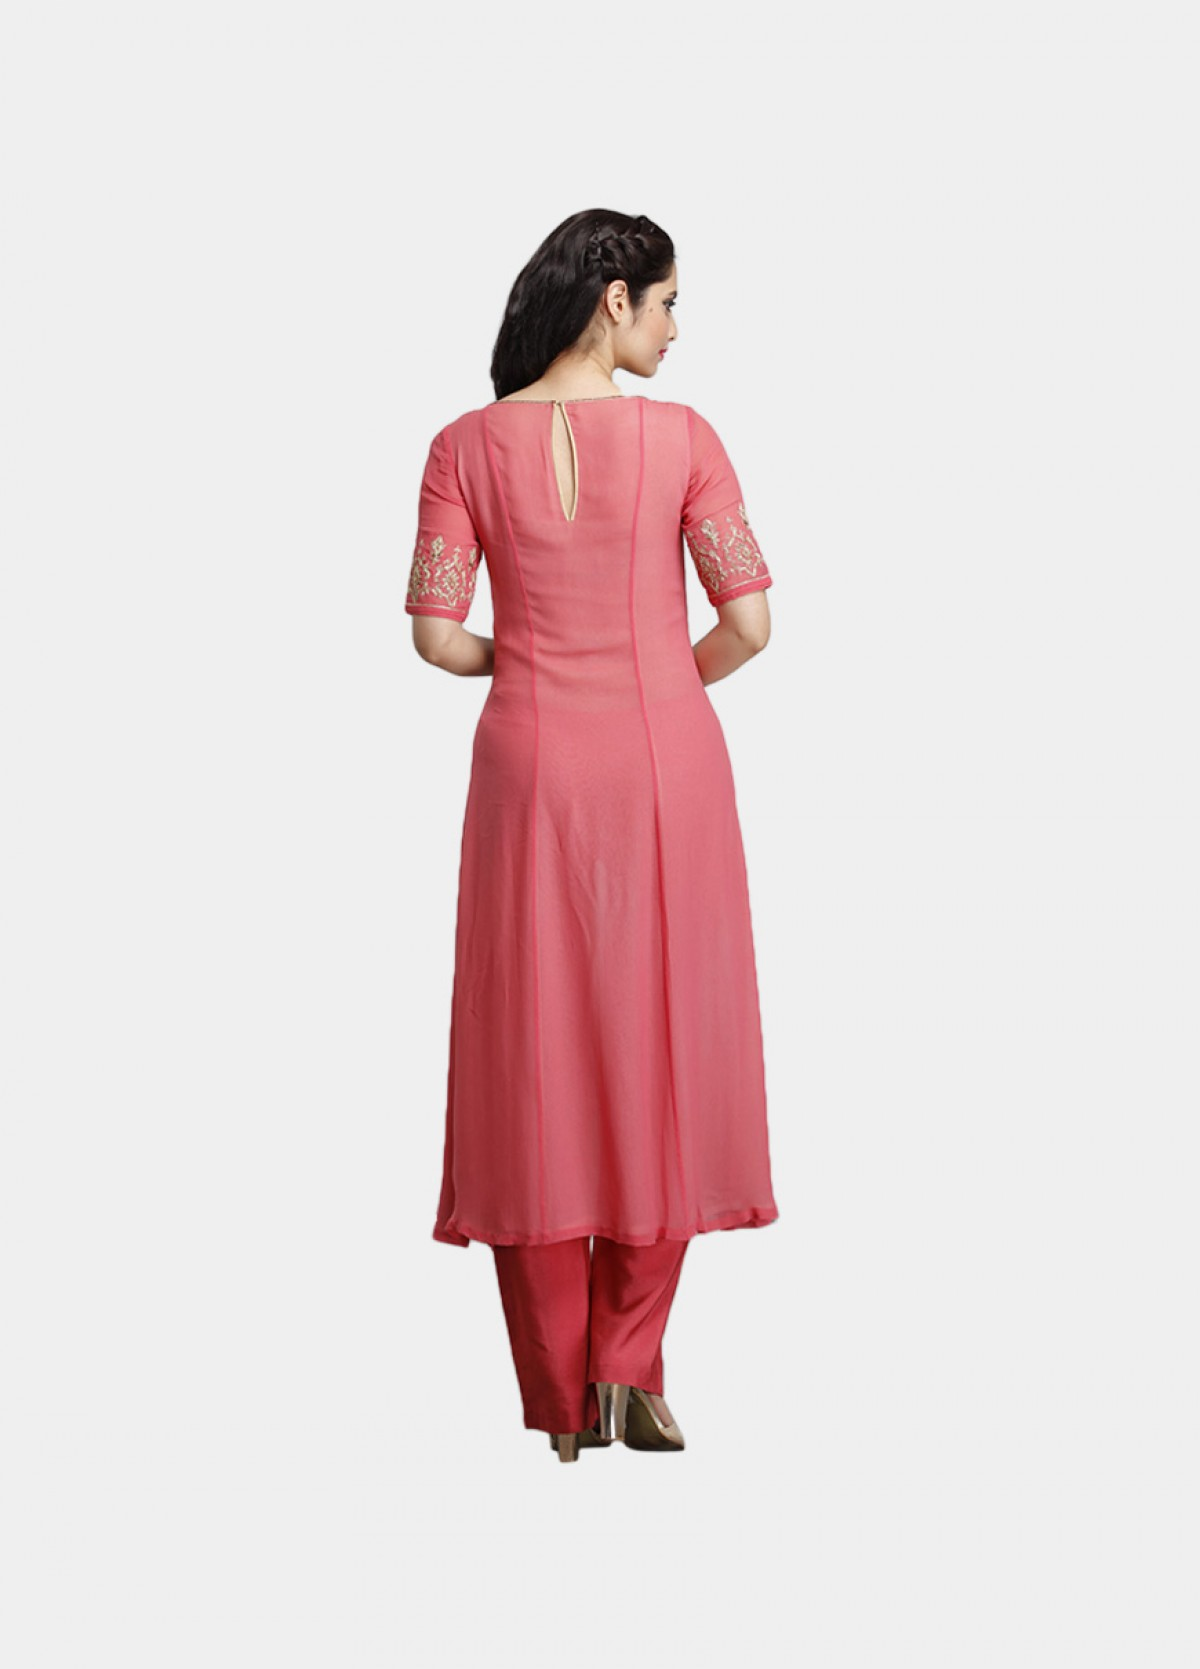 The Double Layered Embroidered Suit Kurta Bottom Dupatta Set